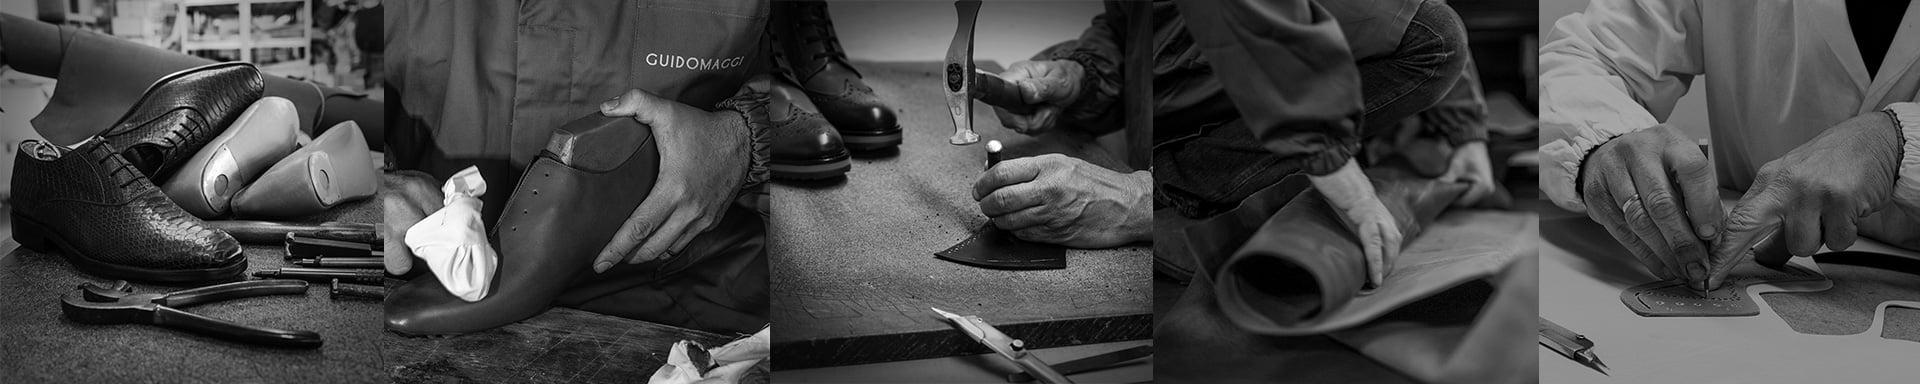 handgenähte italienische Schuhe - handgefertigt in Italien Guidomaggi